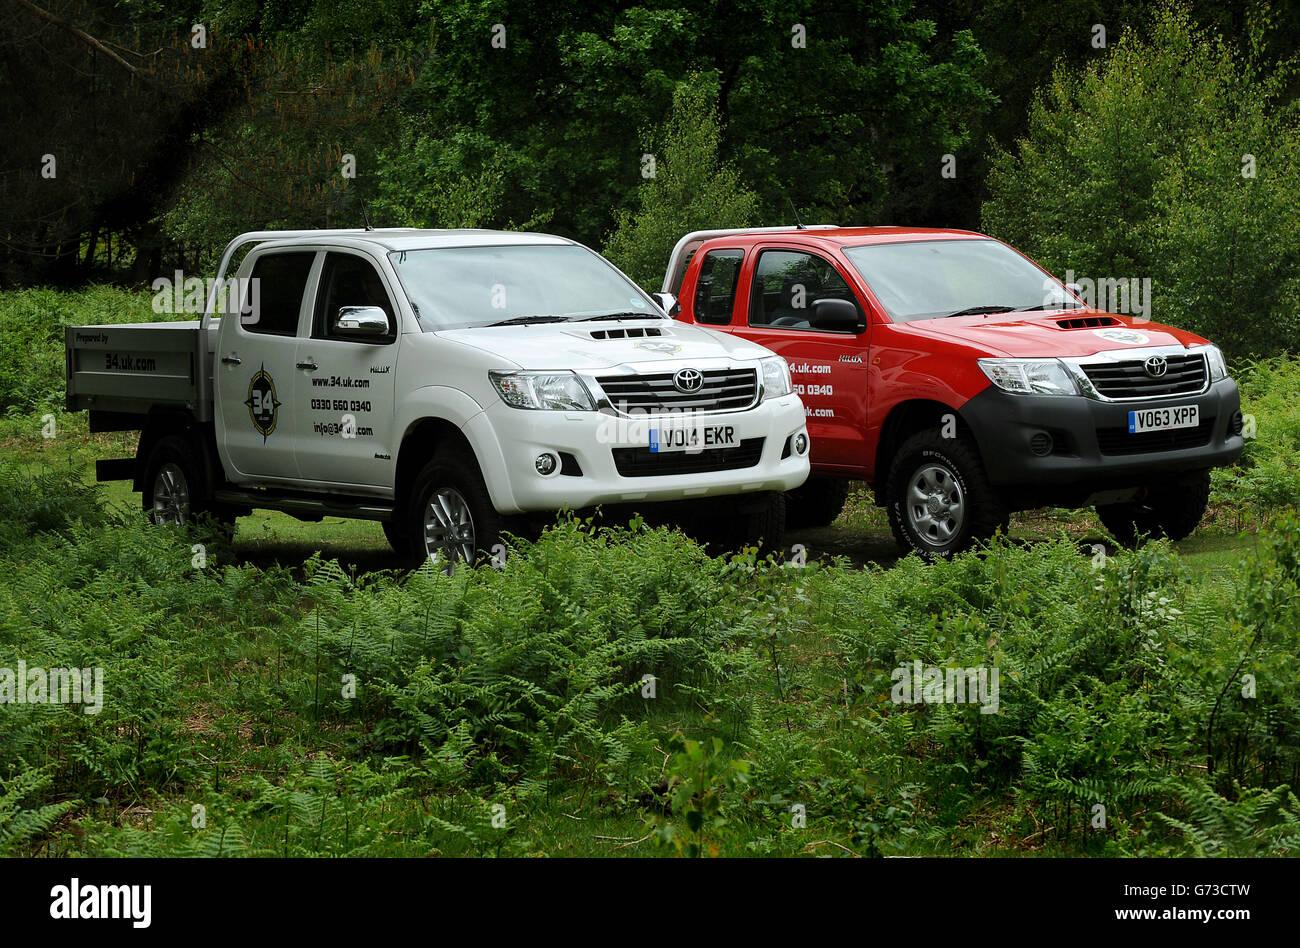 Toyota Fleet handover to SG HLX - Stock Image